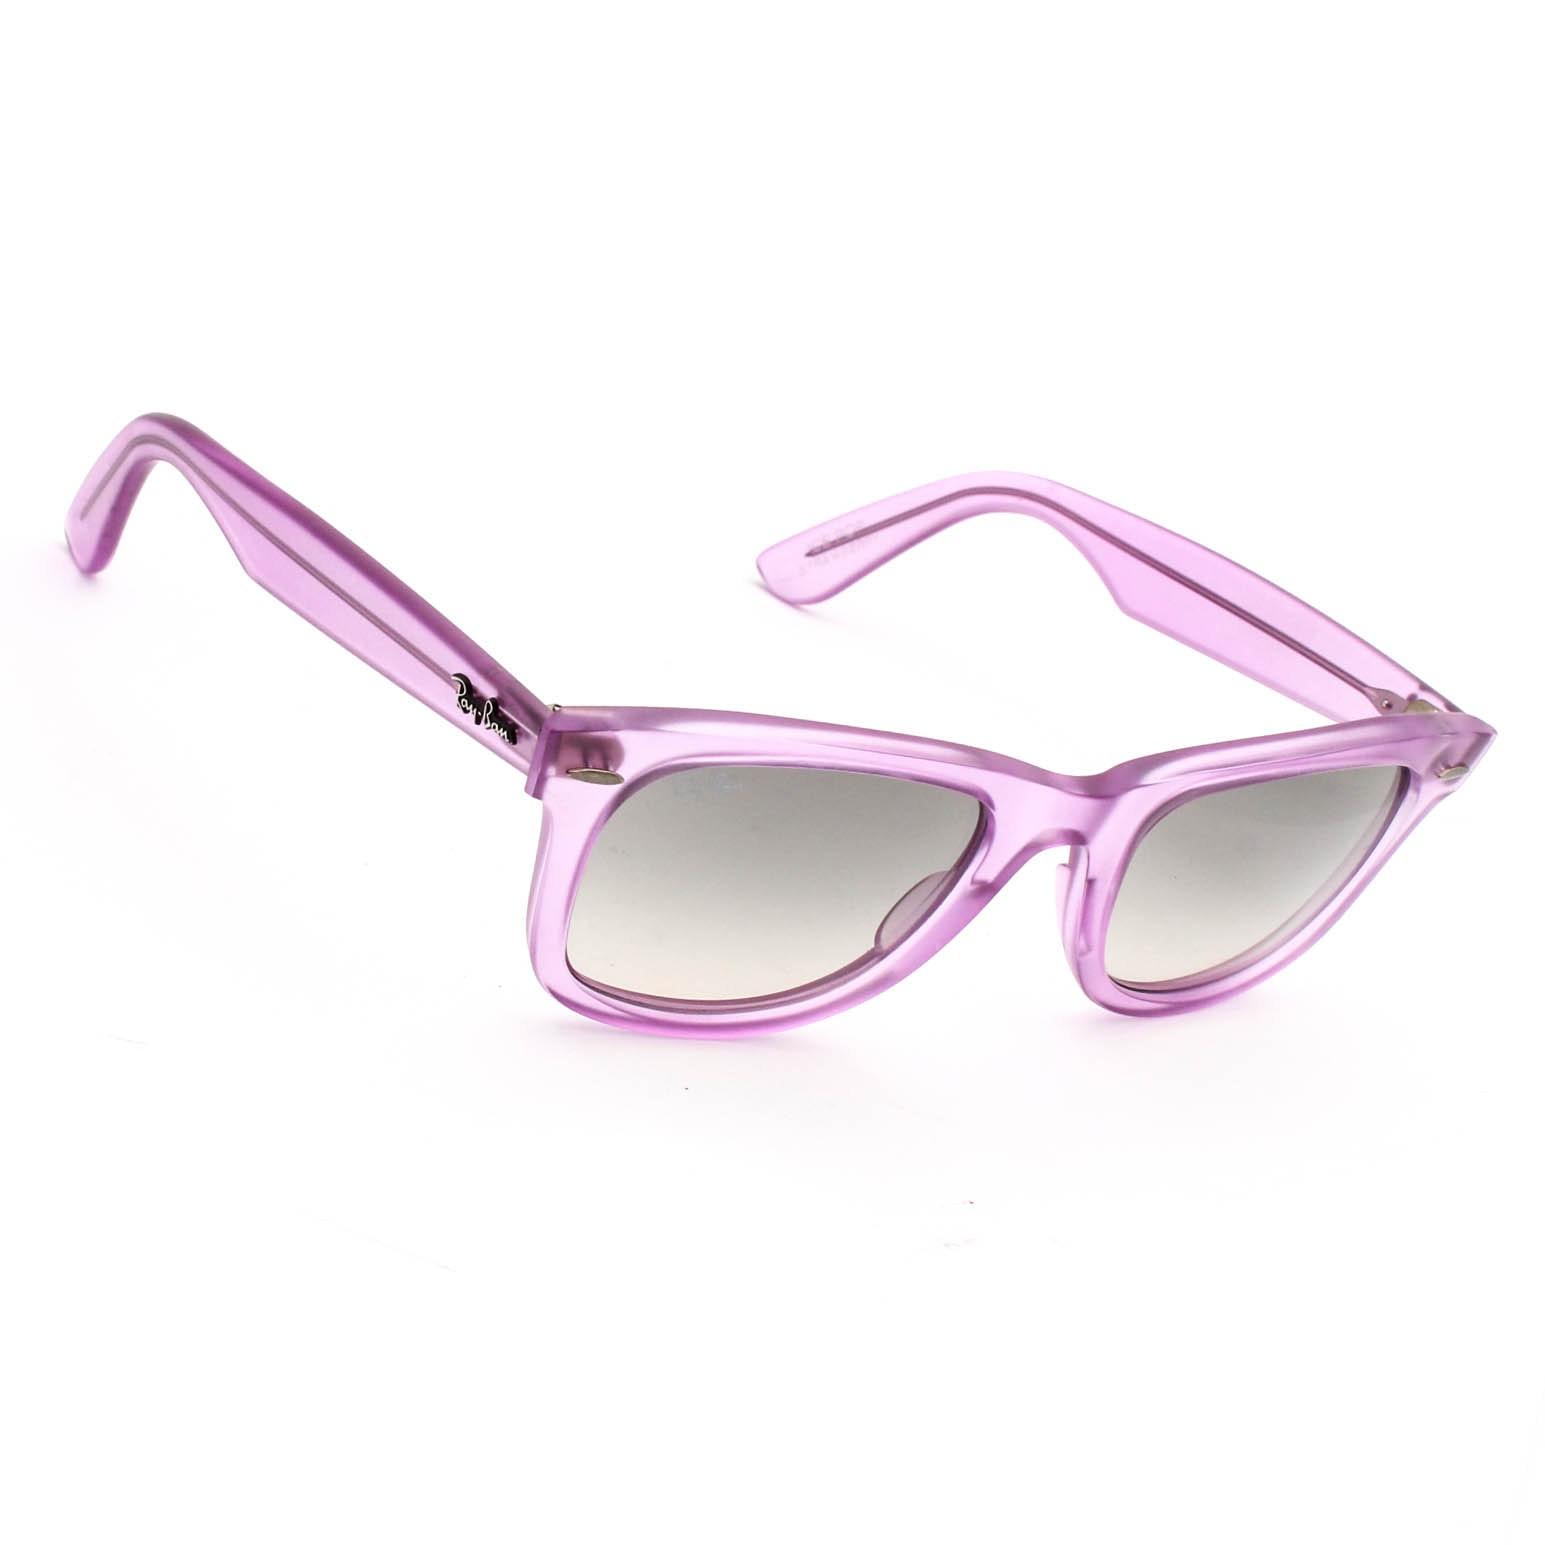 Ray Ban Strawberry Ice Pop Wayfarer Sunglasses